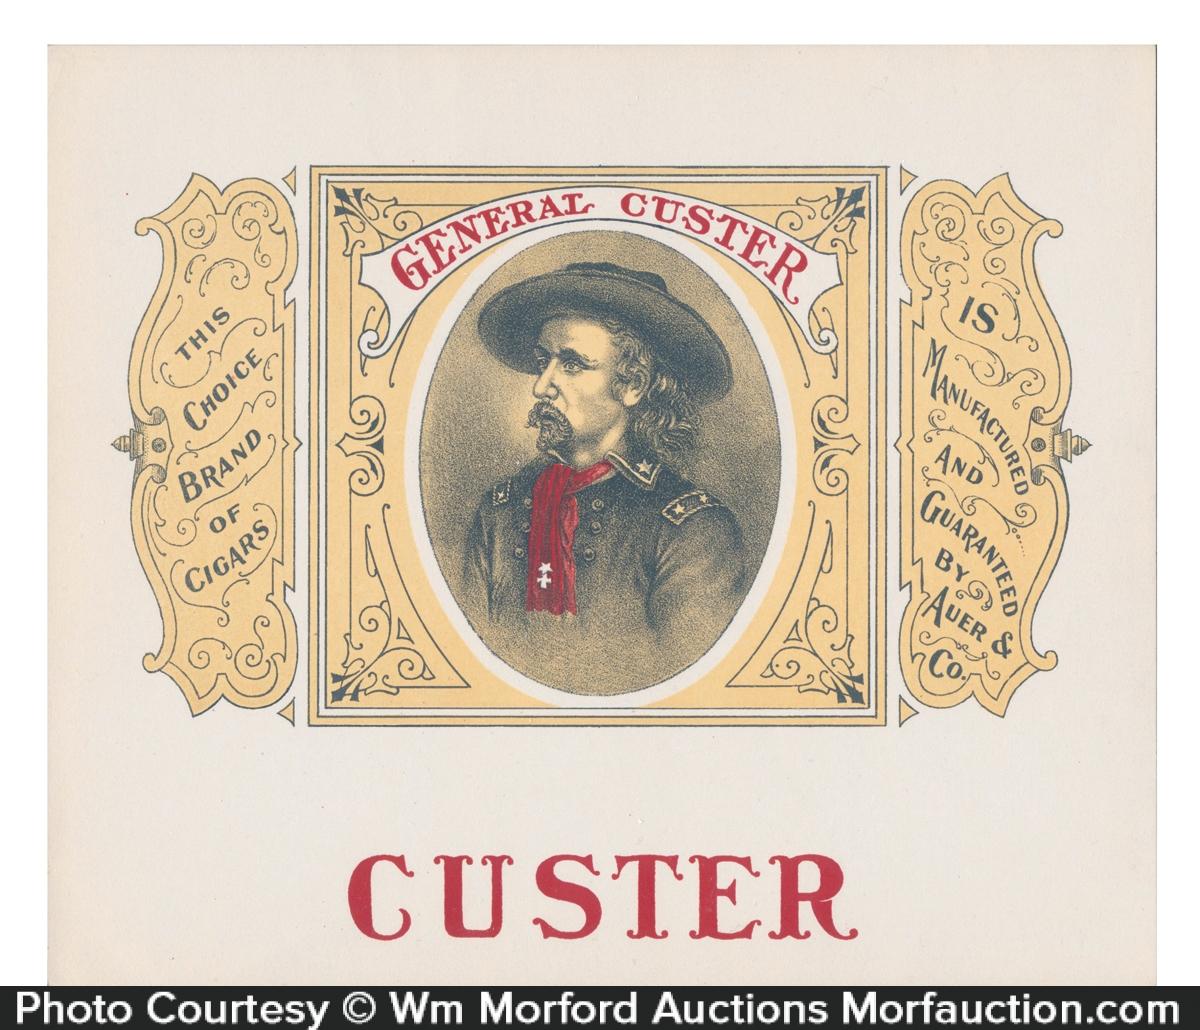 General Custer Cigar Box Label